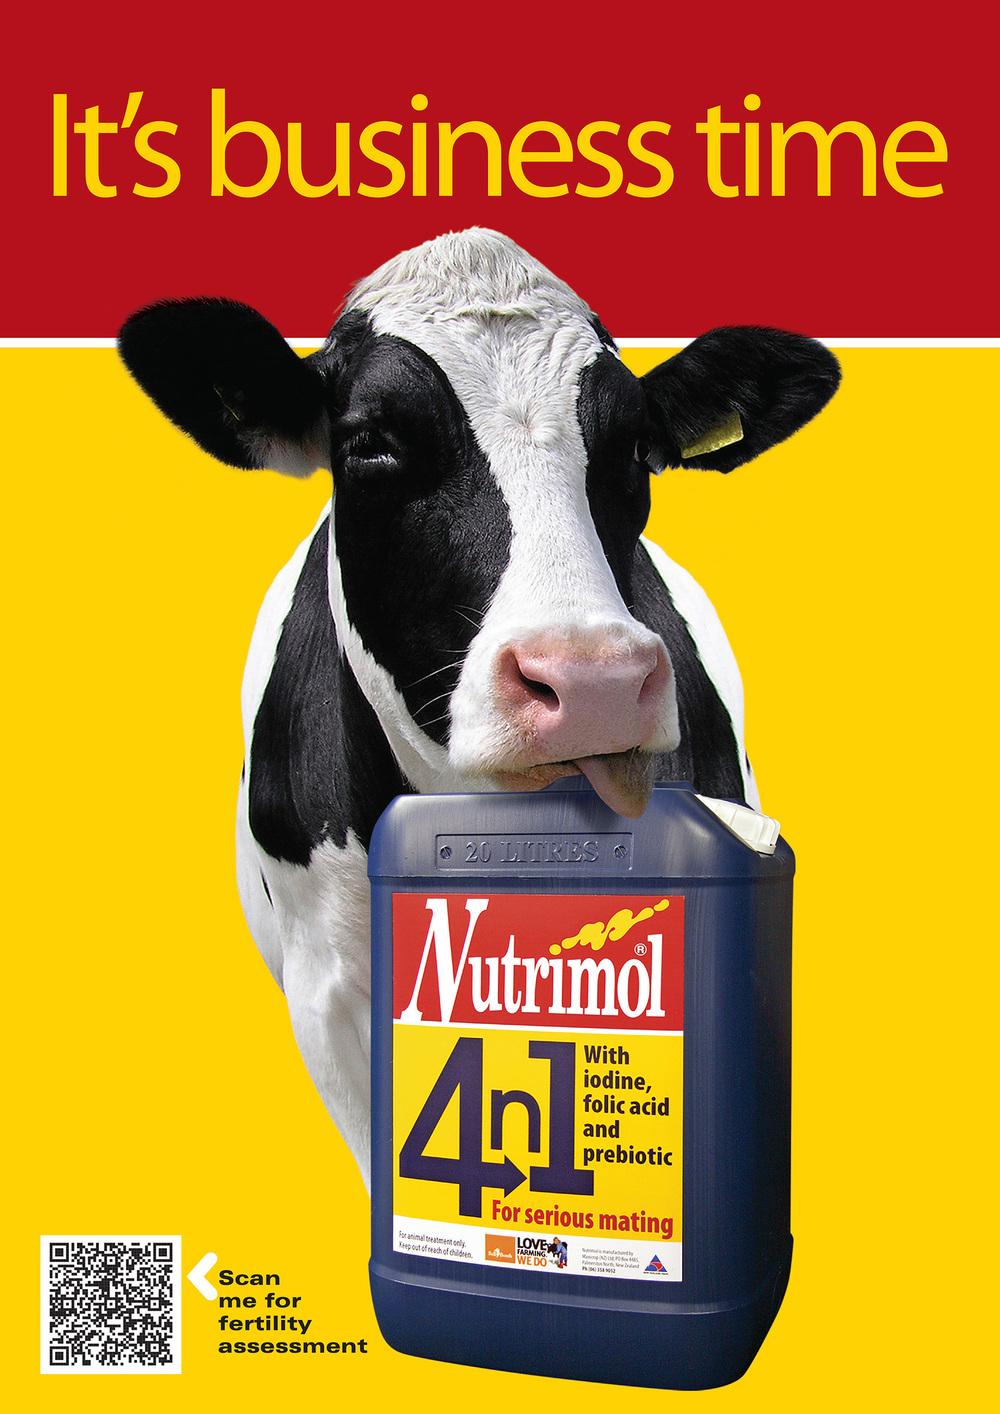 Nutrimol 4n1 A3 poster.jpg